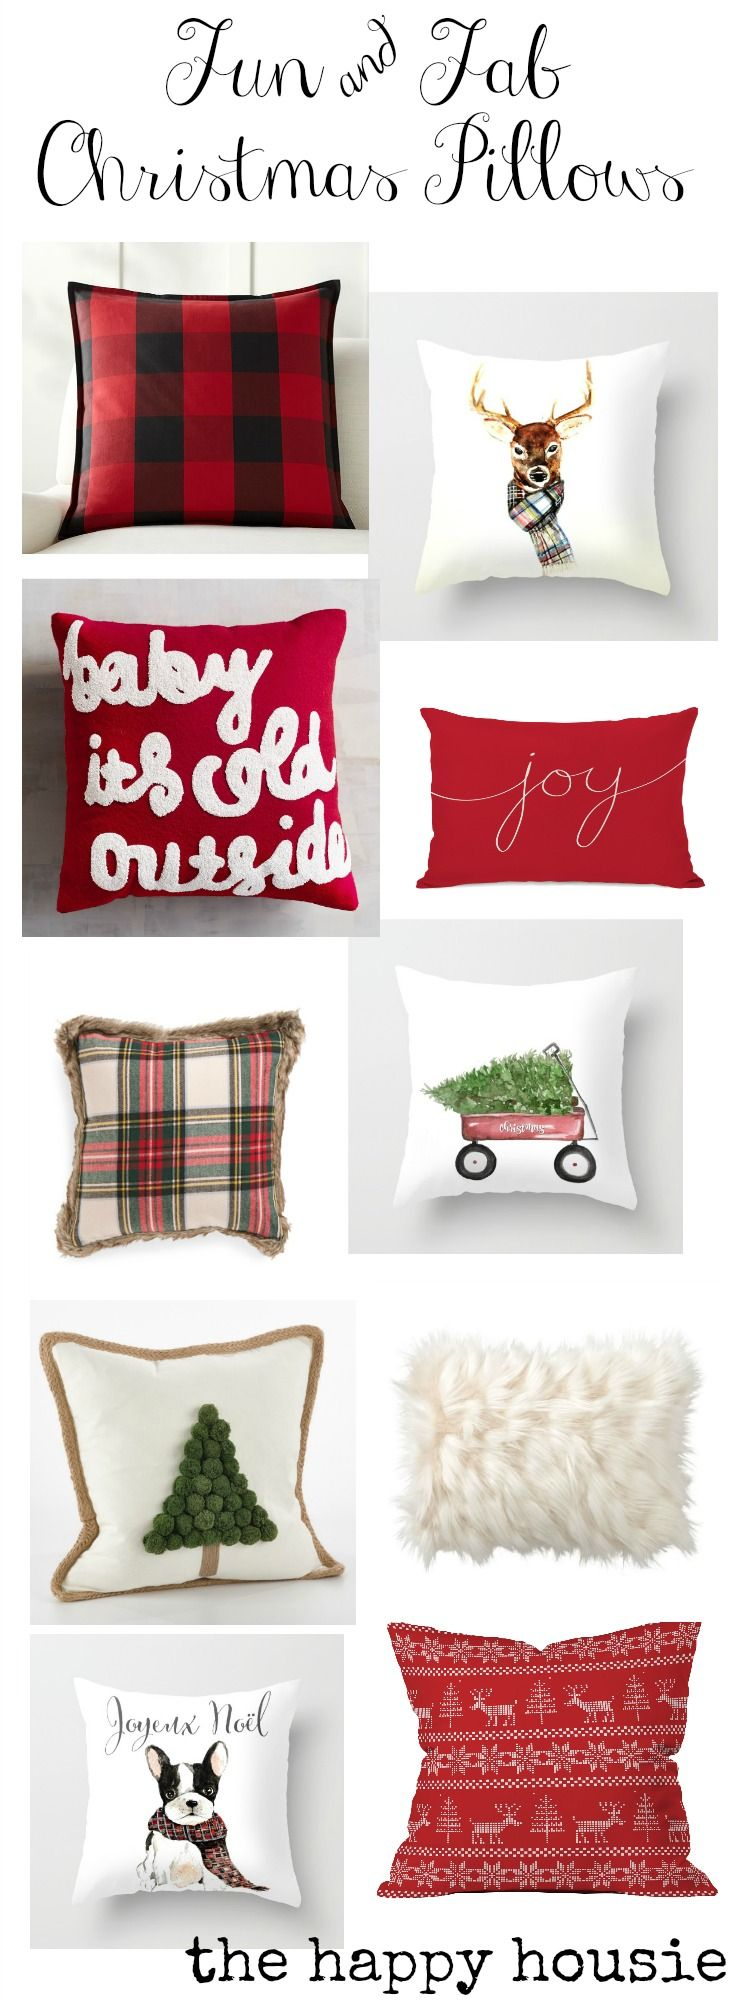 Fridays Finds Fun Fab Christmas Pillows Christmas Typography - Bold diy circus animal cookie pillows